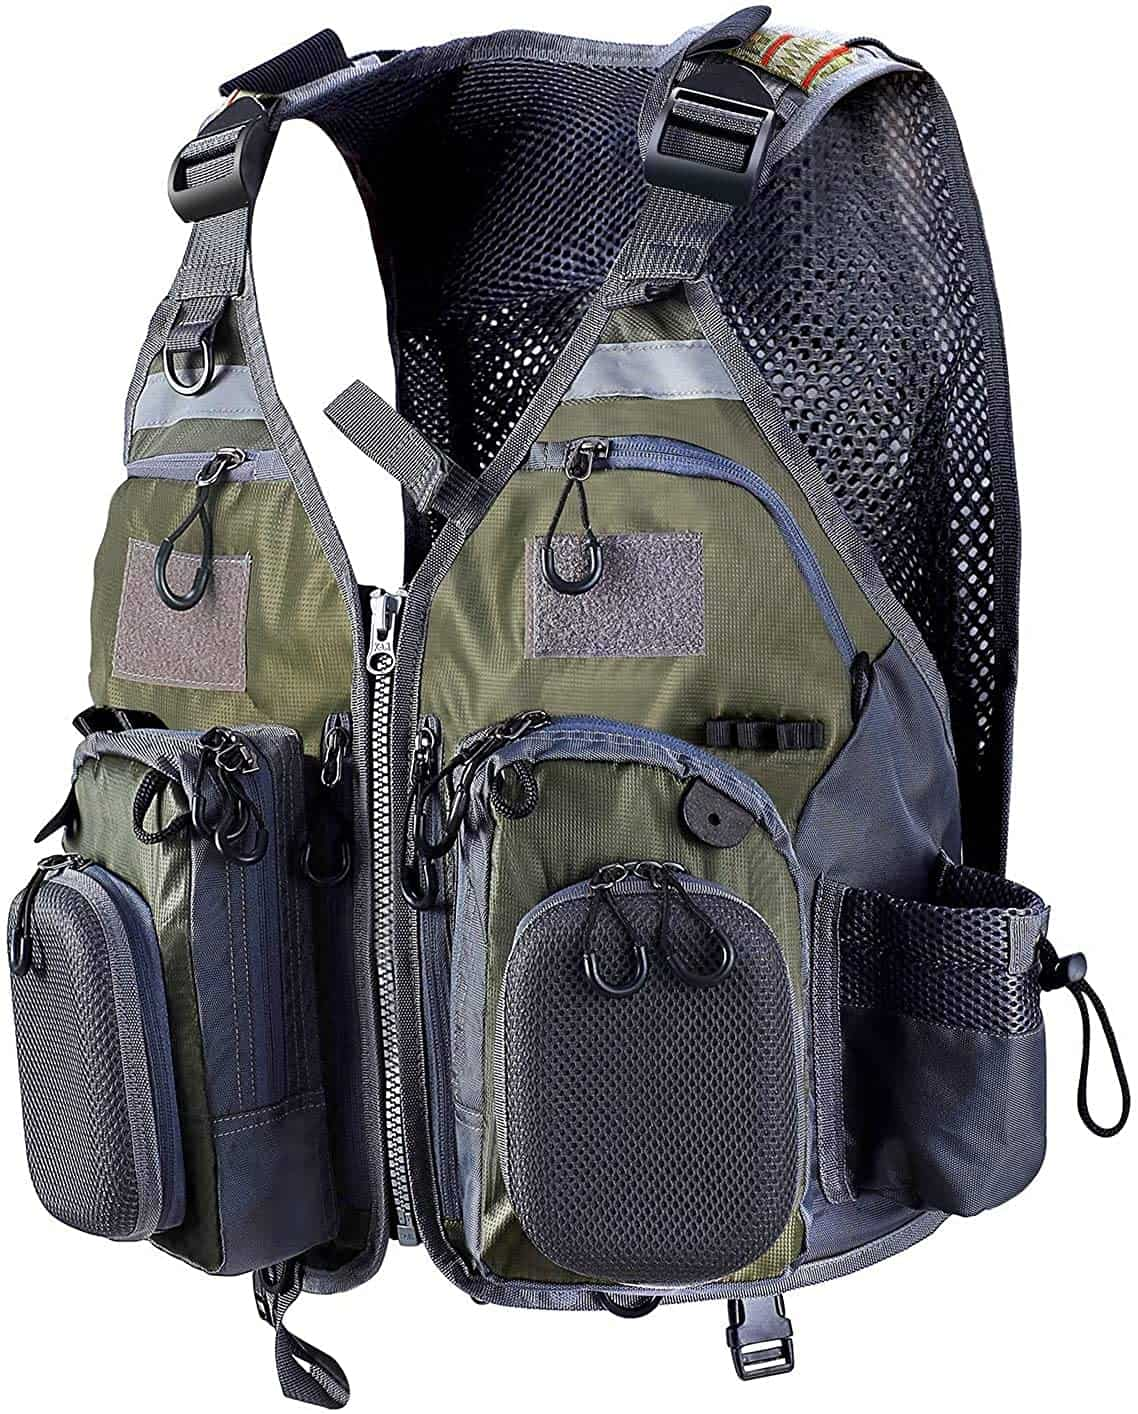 PELLOR Fishing Vest